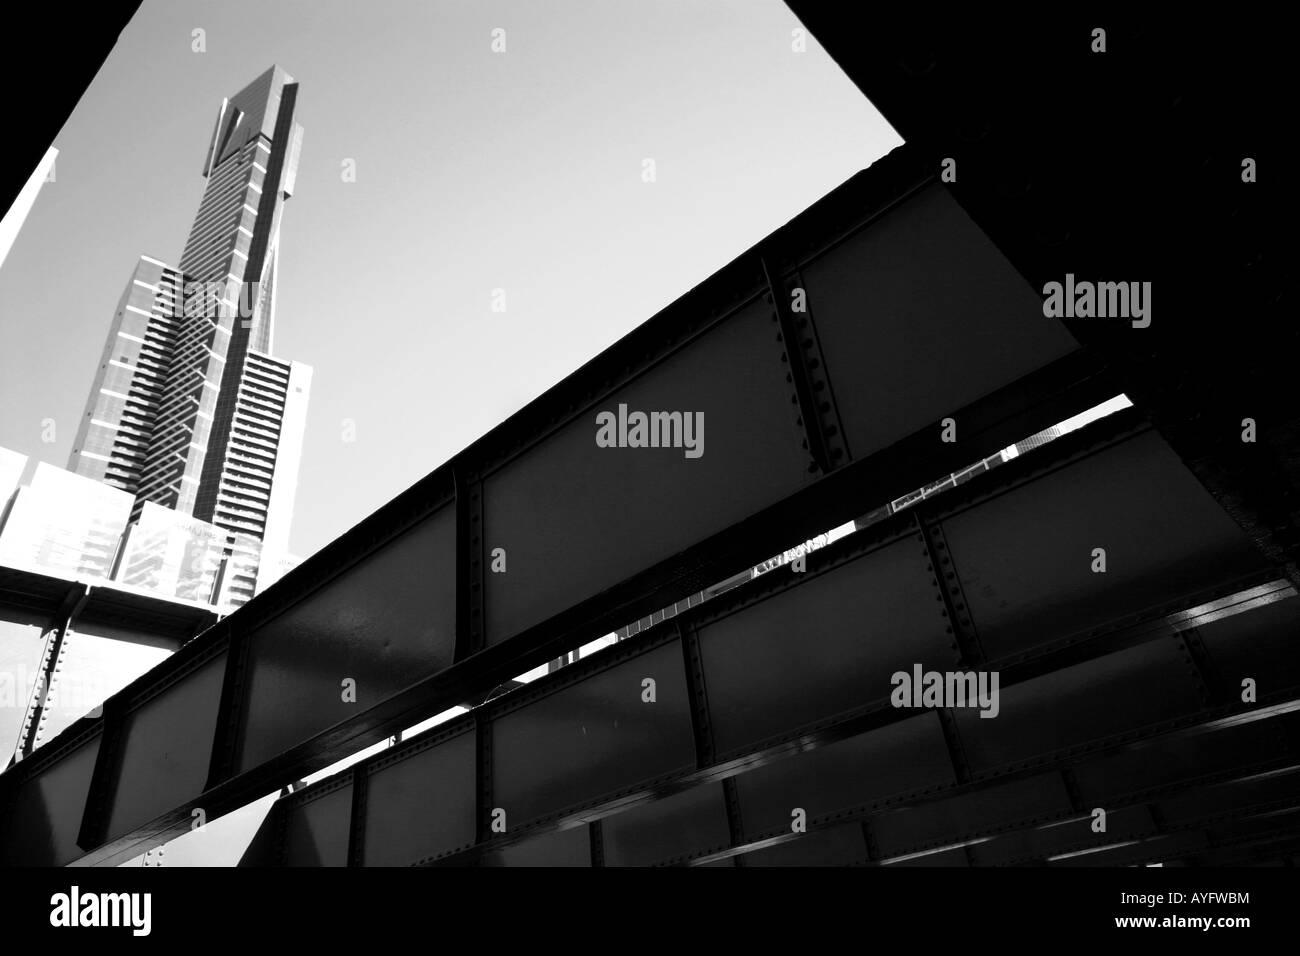 skyline, skylines, water, city, cities, view, on, town, view, on, towns, view, on, city, view, on, cities, urban, - Stock Image